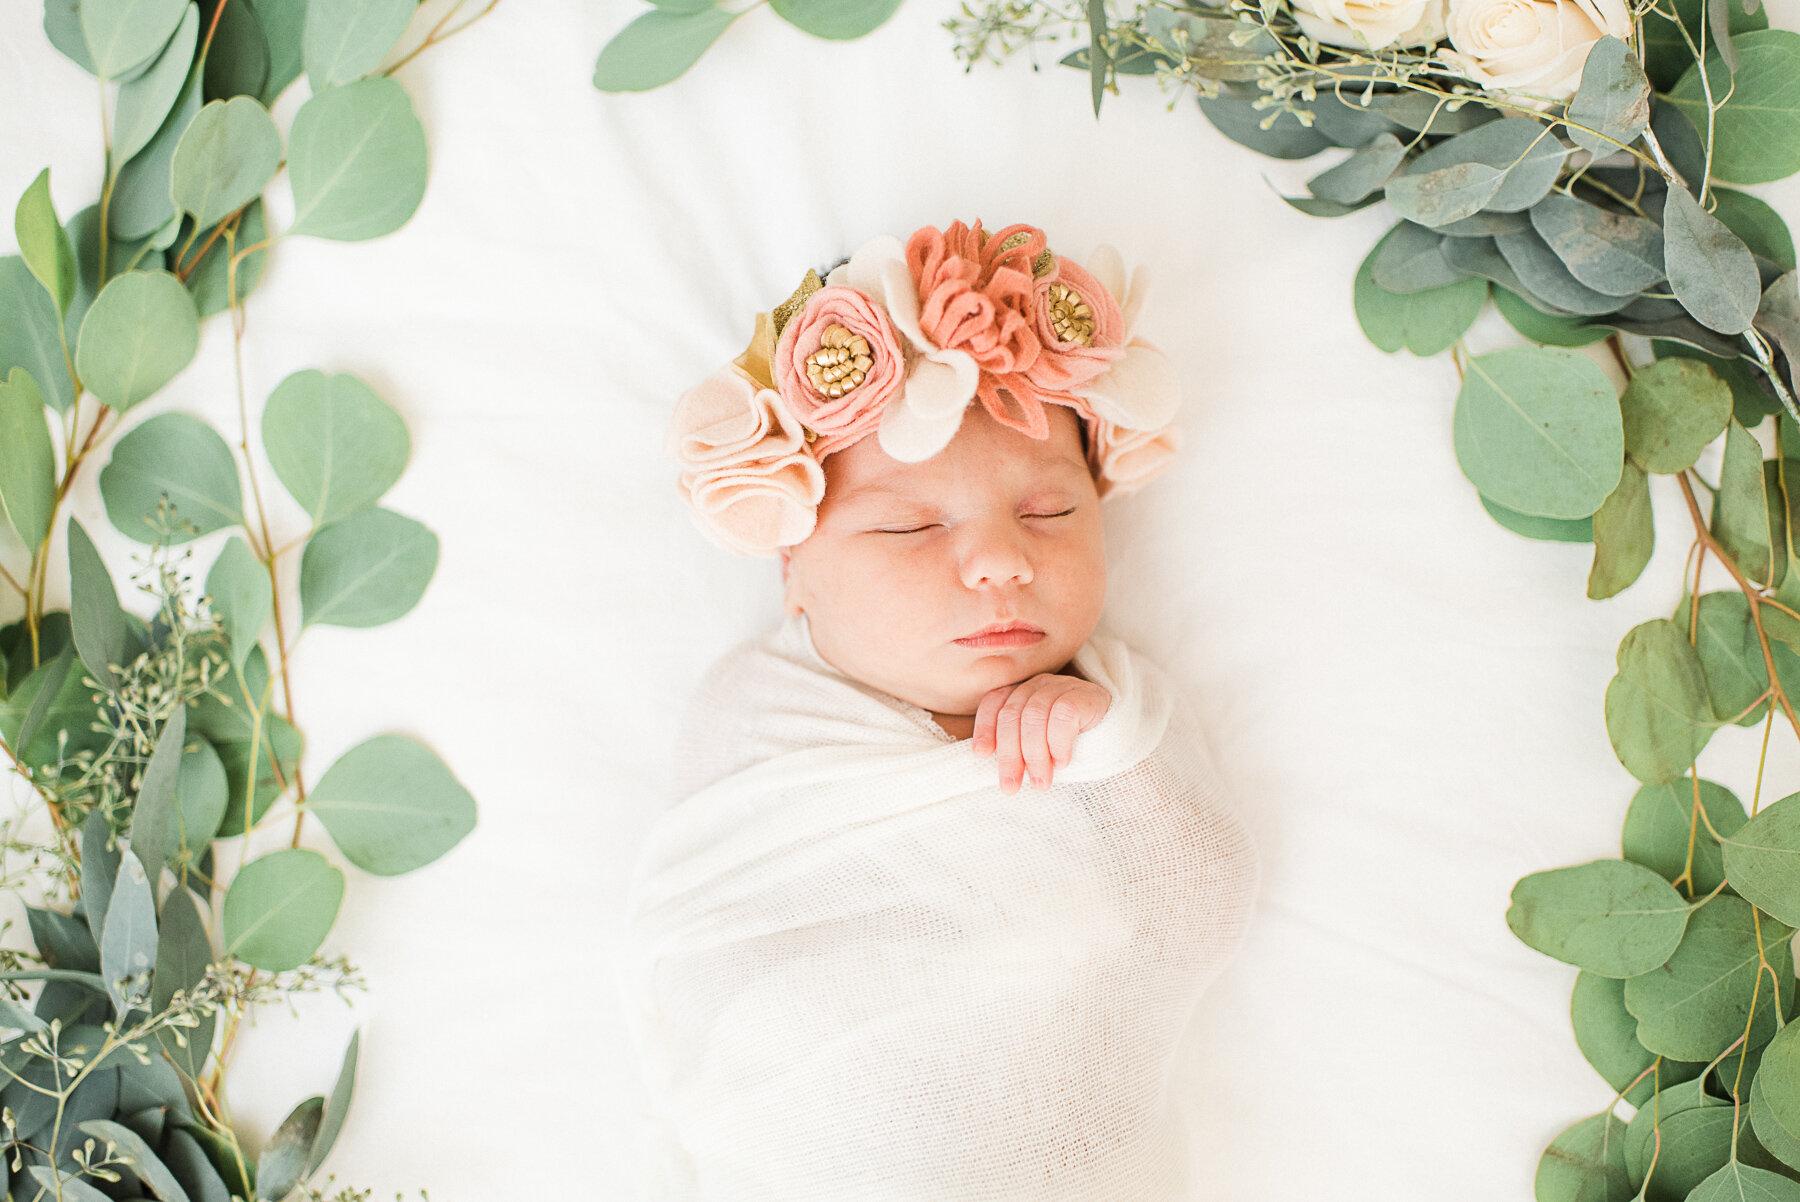 ParkBenchPhotography-Dallas-Baby-Photographer-195.jpg